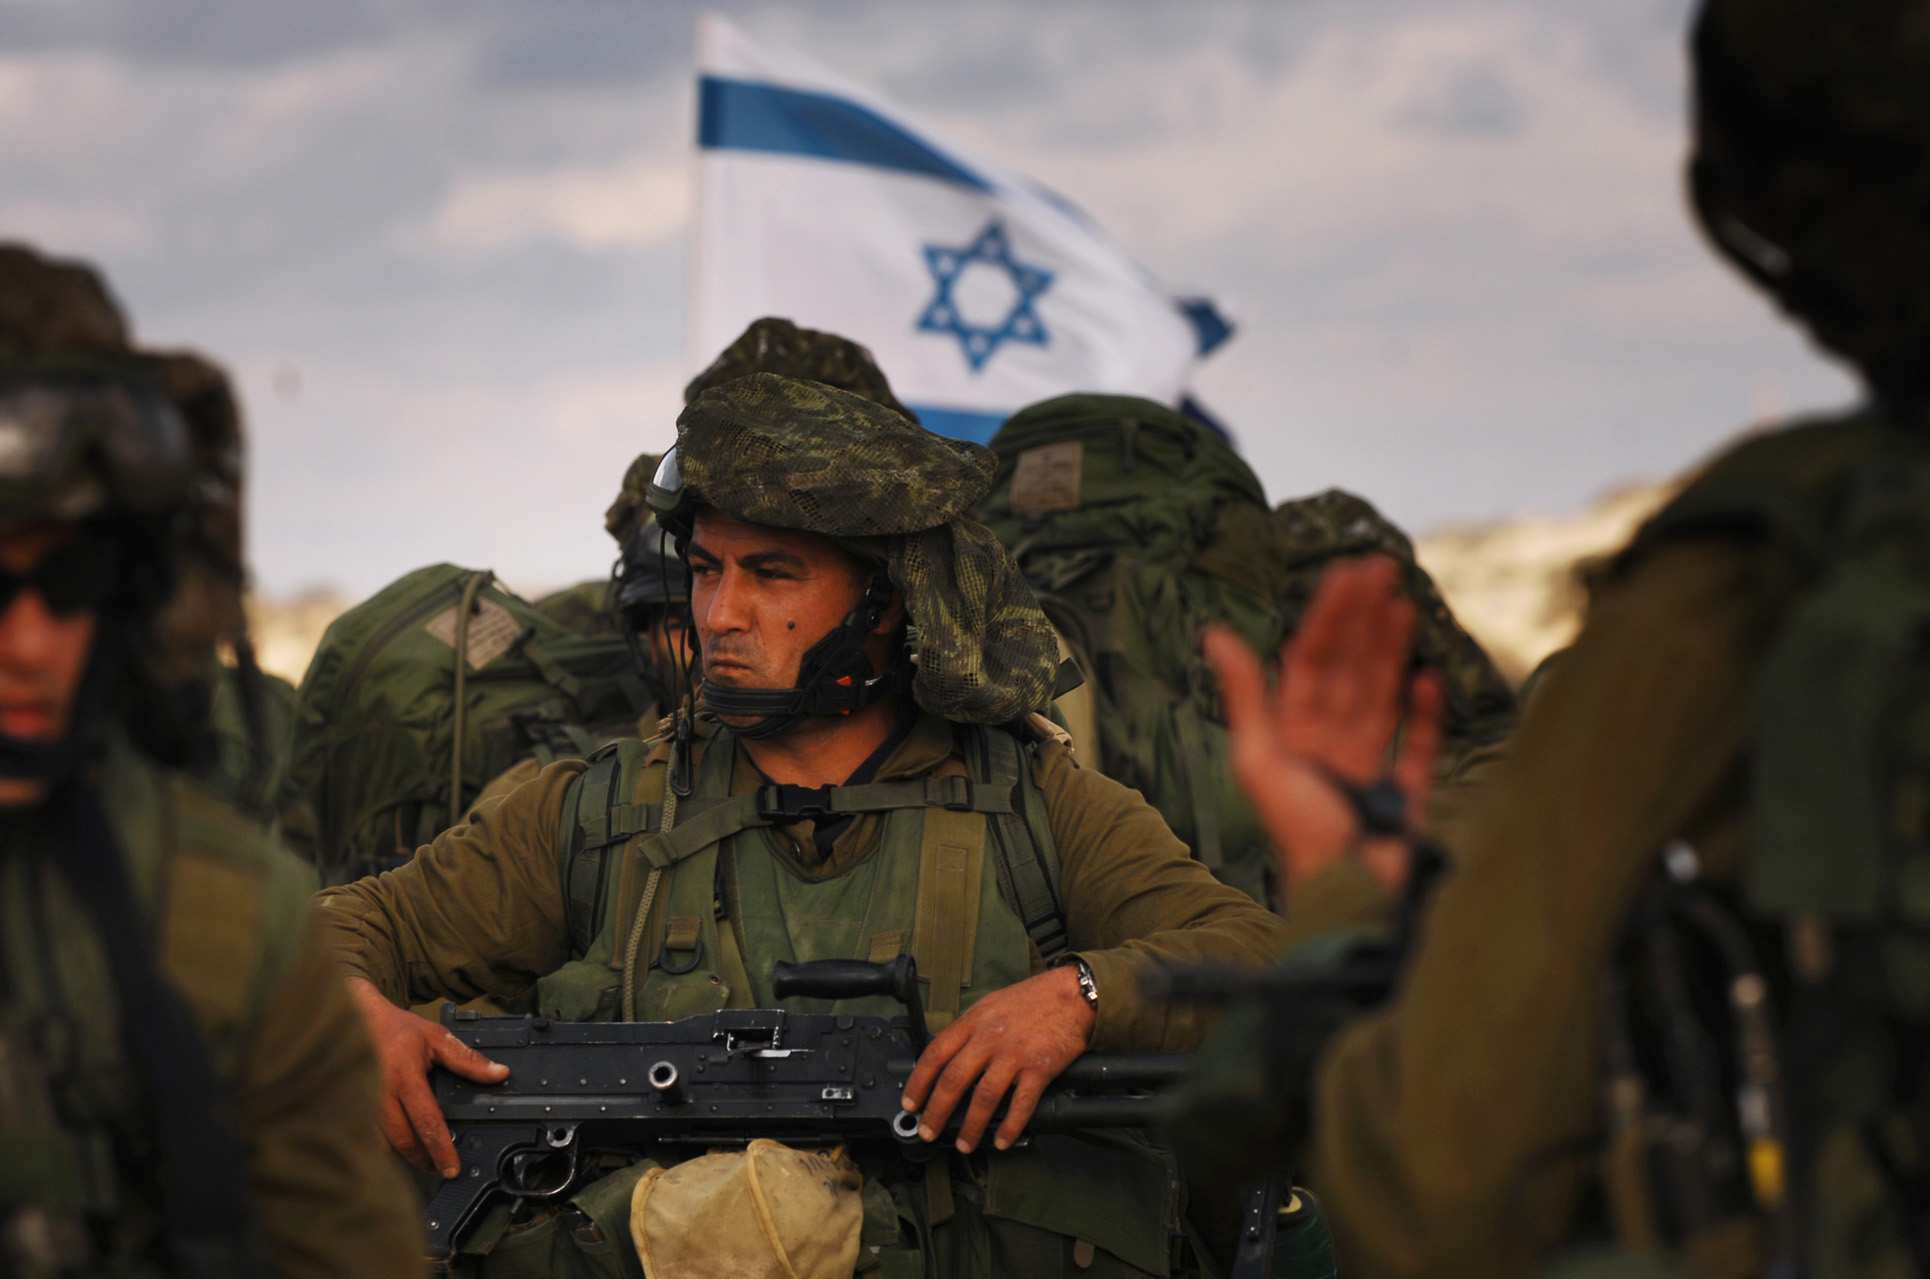 СРОЧНО: Армии Израиля и Сирии обменялись артиллерийскими ударами | Русская весна